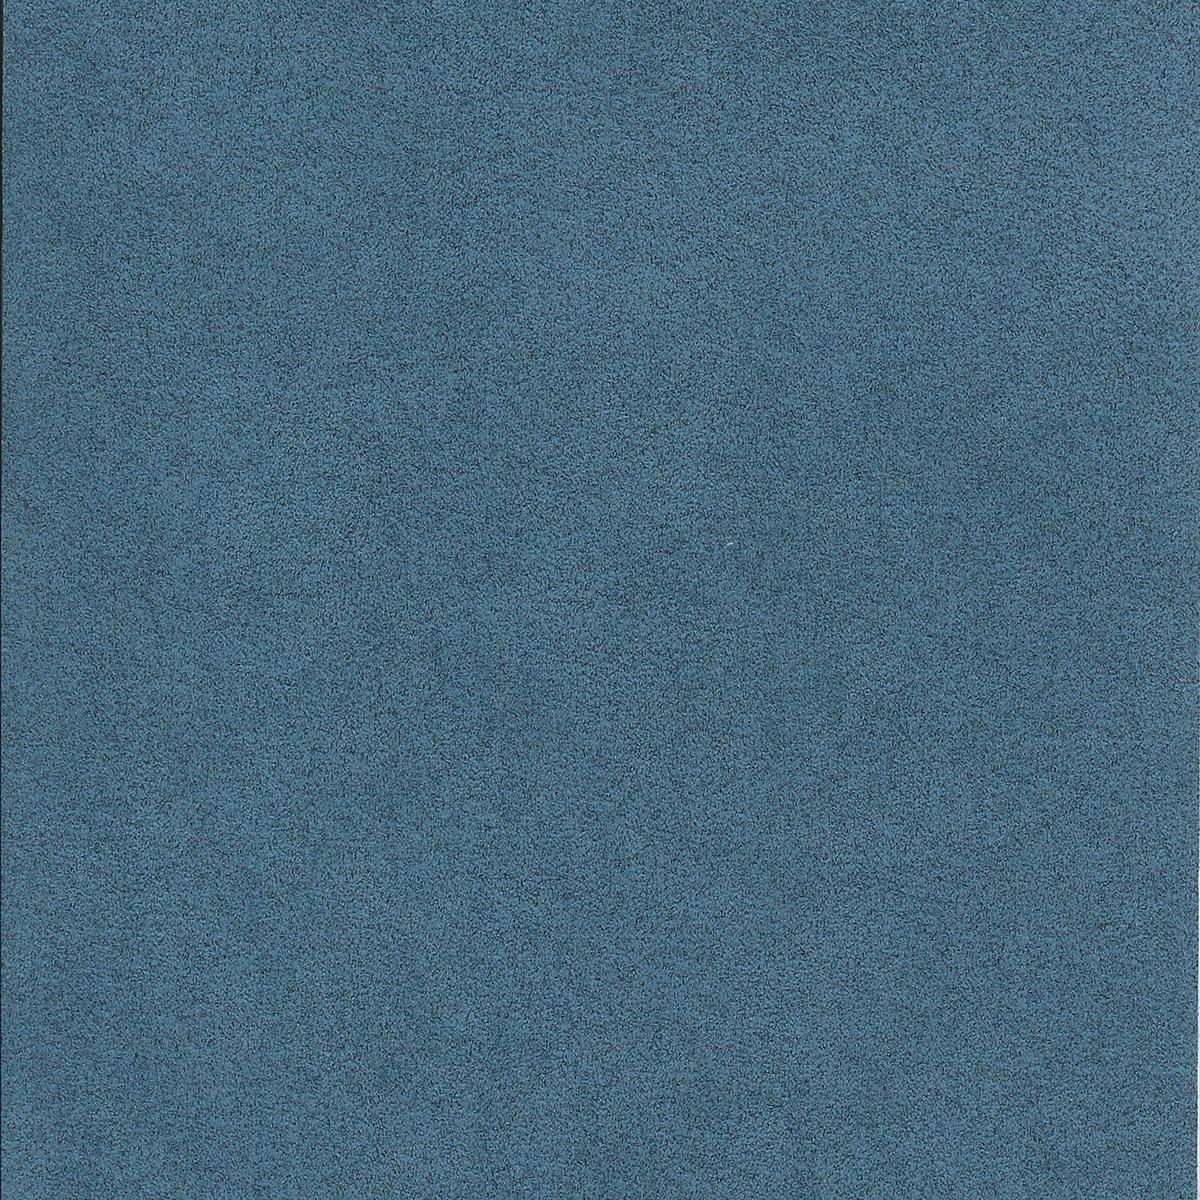 681 Blu Denim